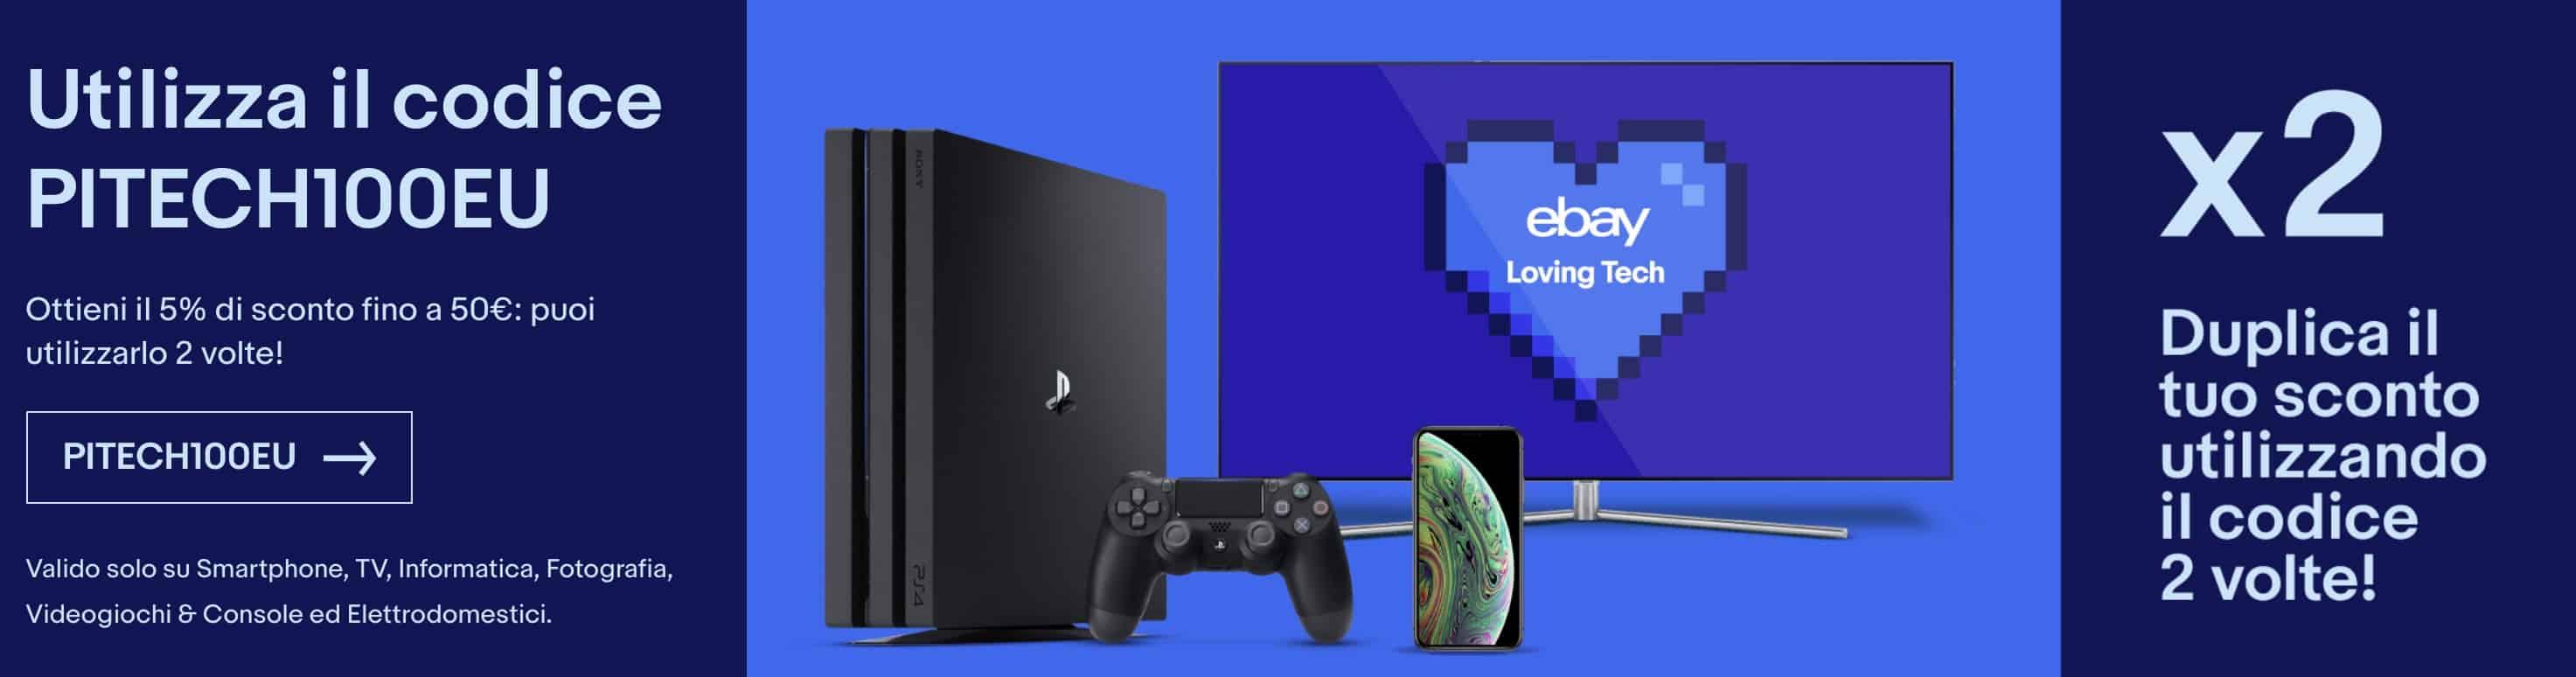 sconto ebay febbraio 2019